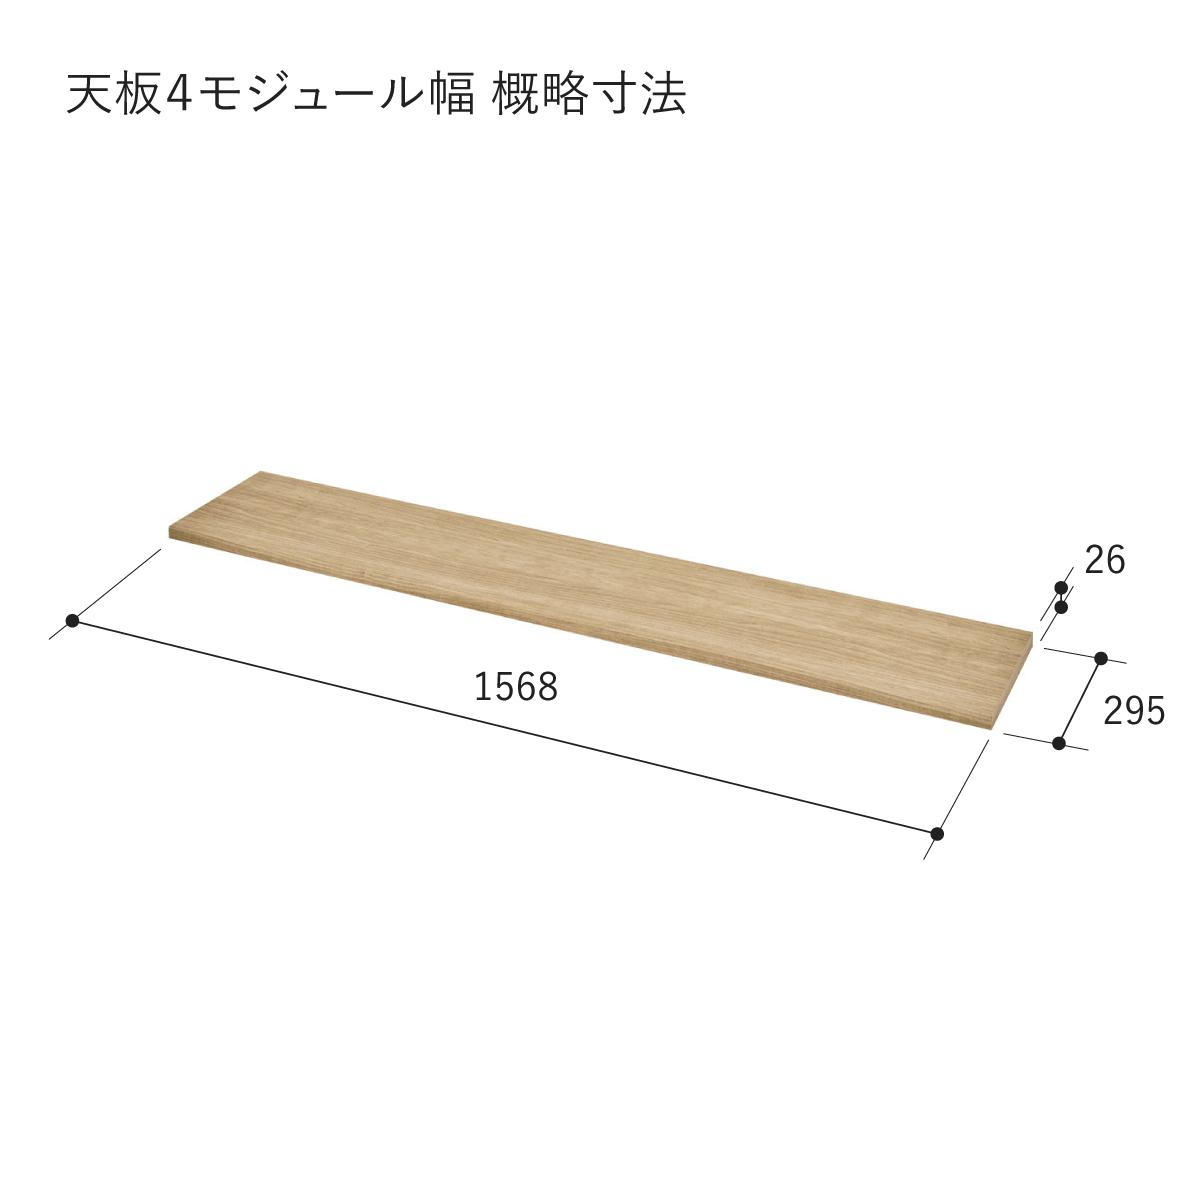 【V-TISS LIGHT】 天板 4モジュール幅(背面溝なし)